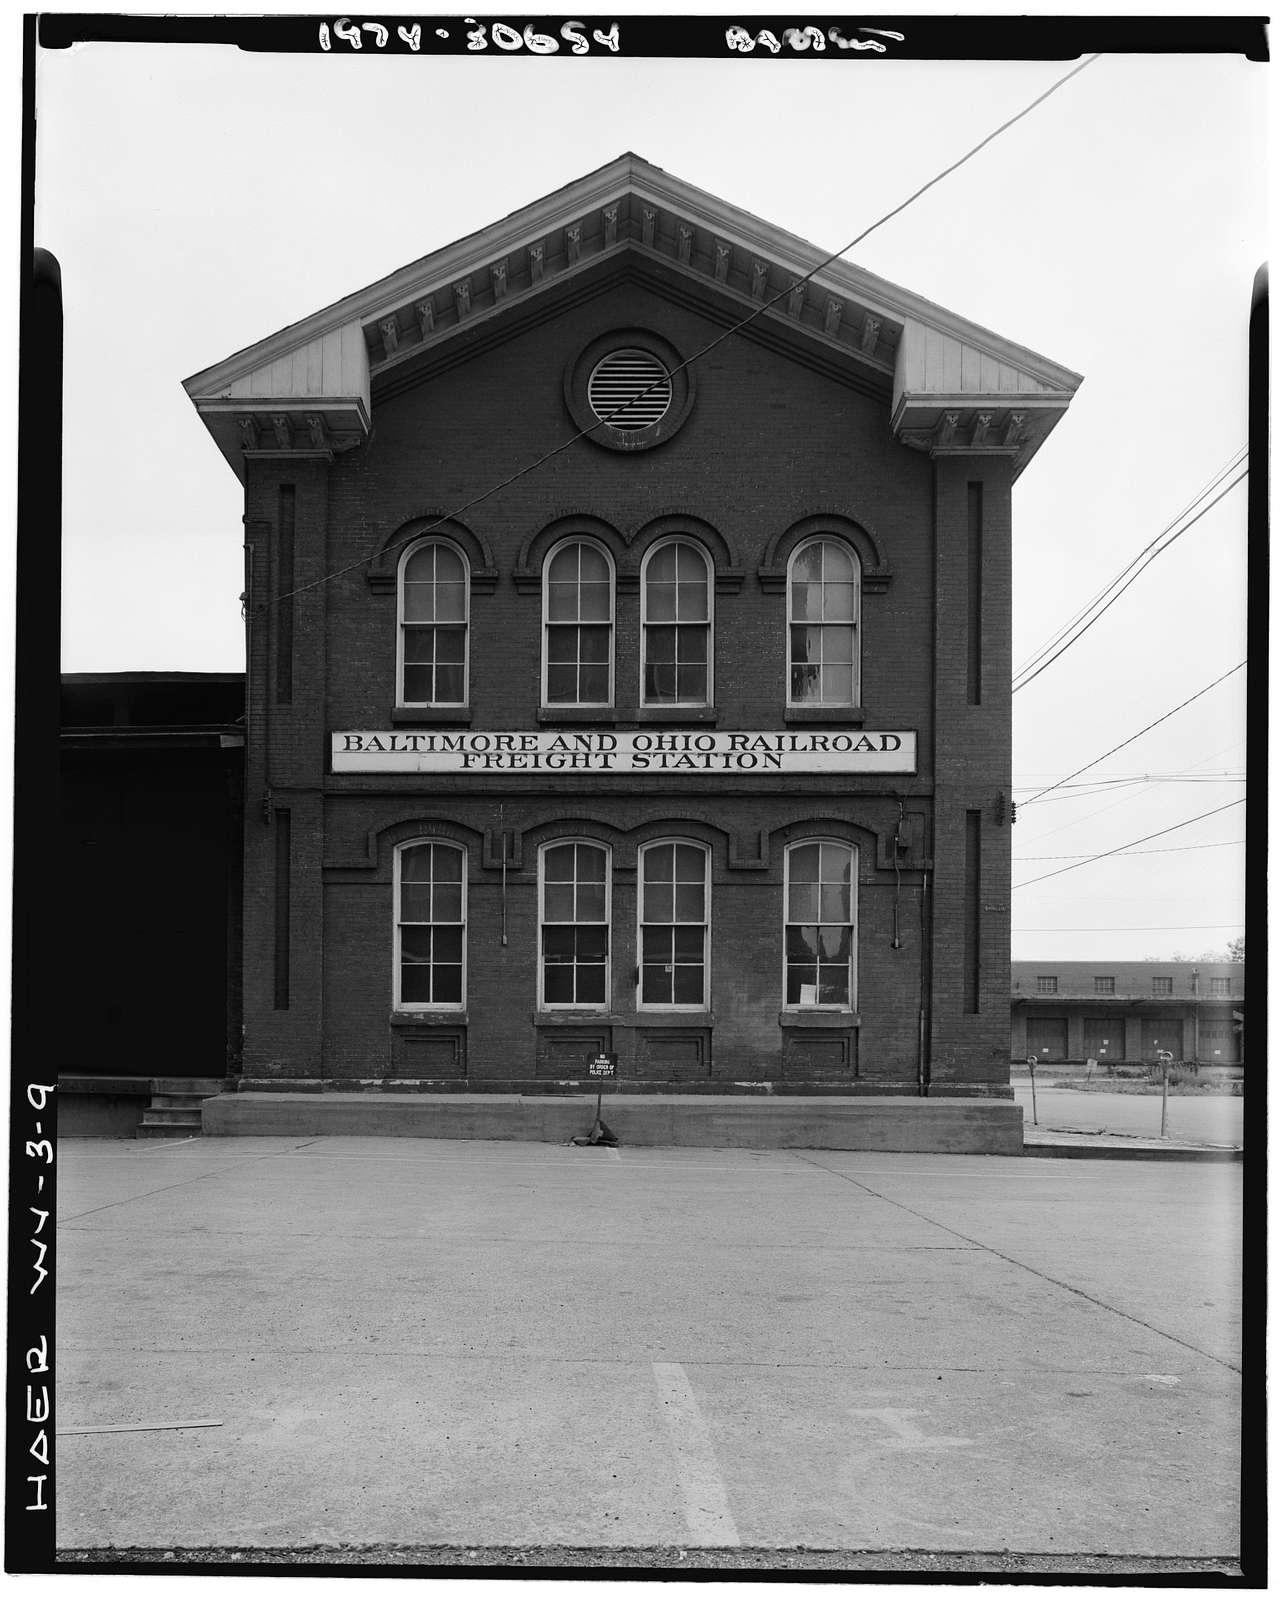 Baltimore & Ohio Railroad, Wheeling Freight Station, Fourteenth & South Streets, Wheeling, Ohio County, WV